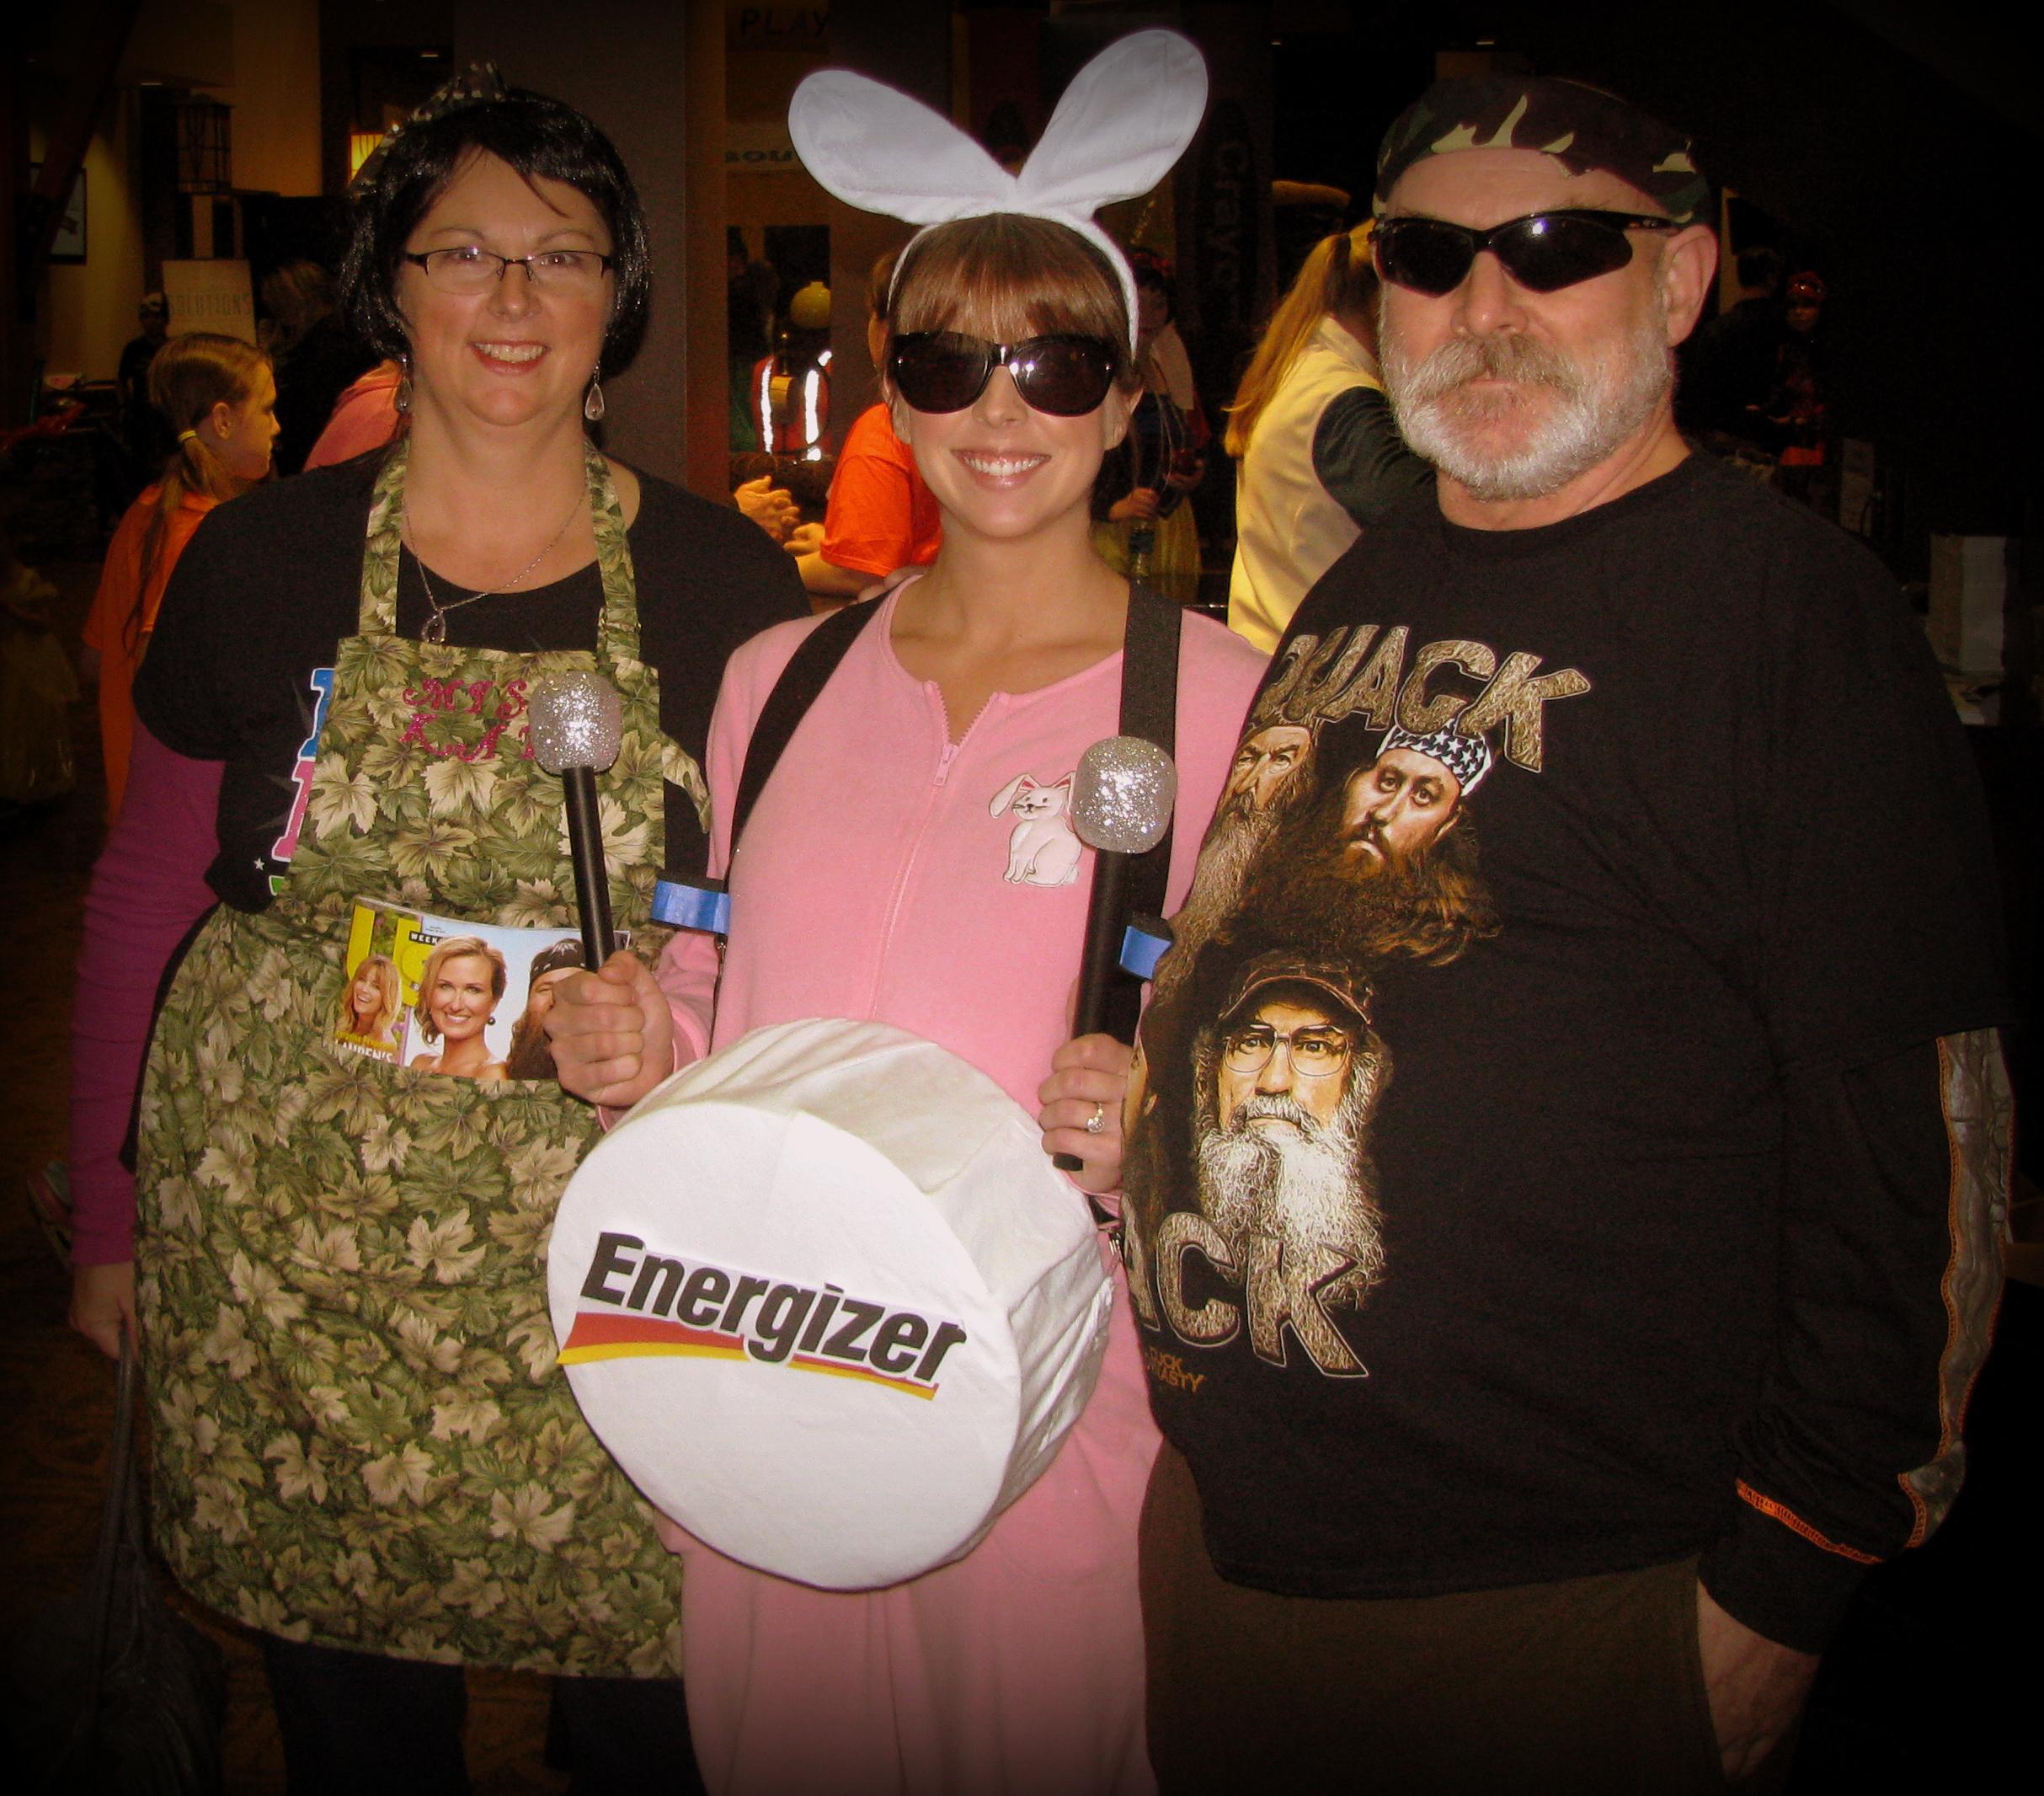 Energizer Bunny  sc 1 st  The Unedited Mama - WordPress.com & Halloween costumes | The Unedited Mama